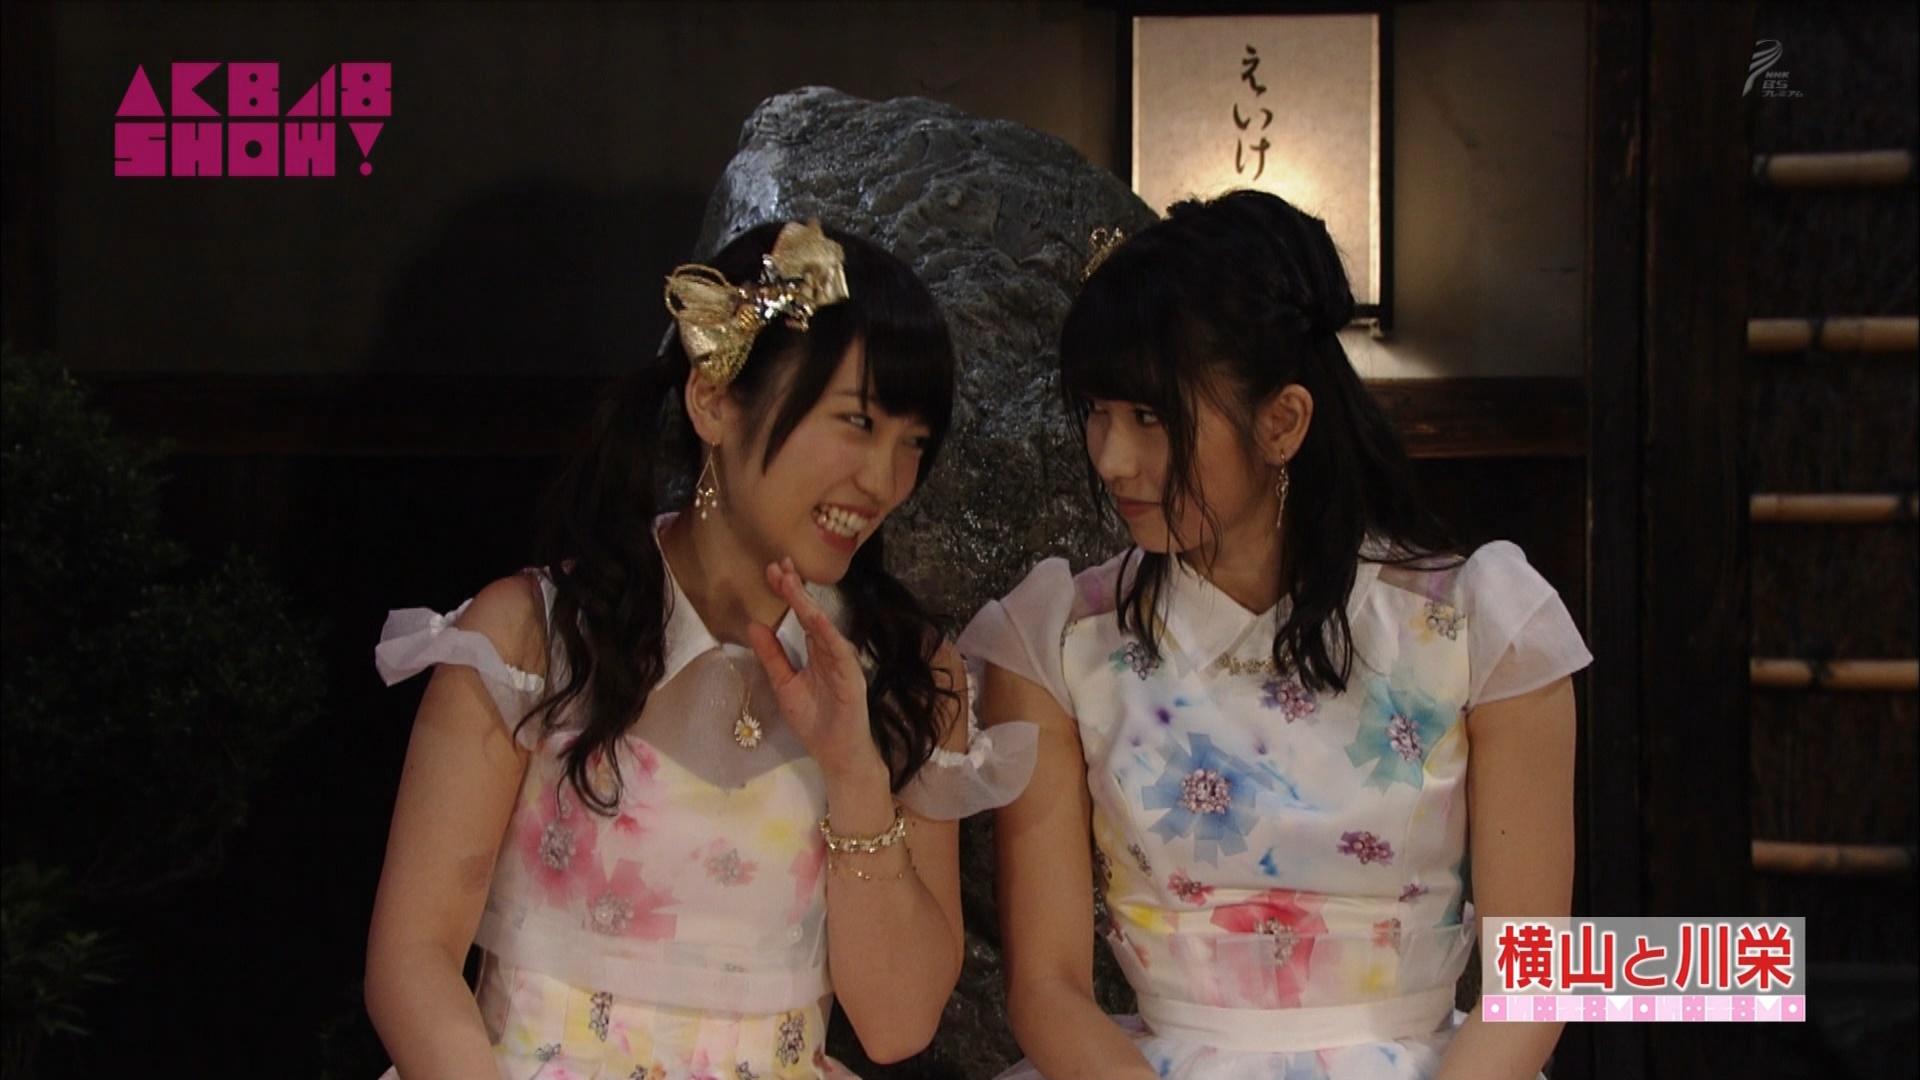 横山由依と川栄李奈 AKB48SHOW! 20140906 (26)